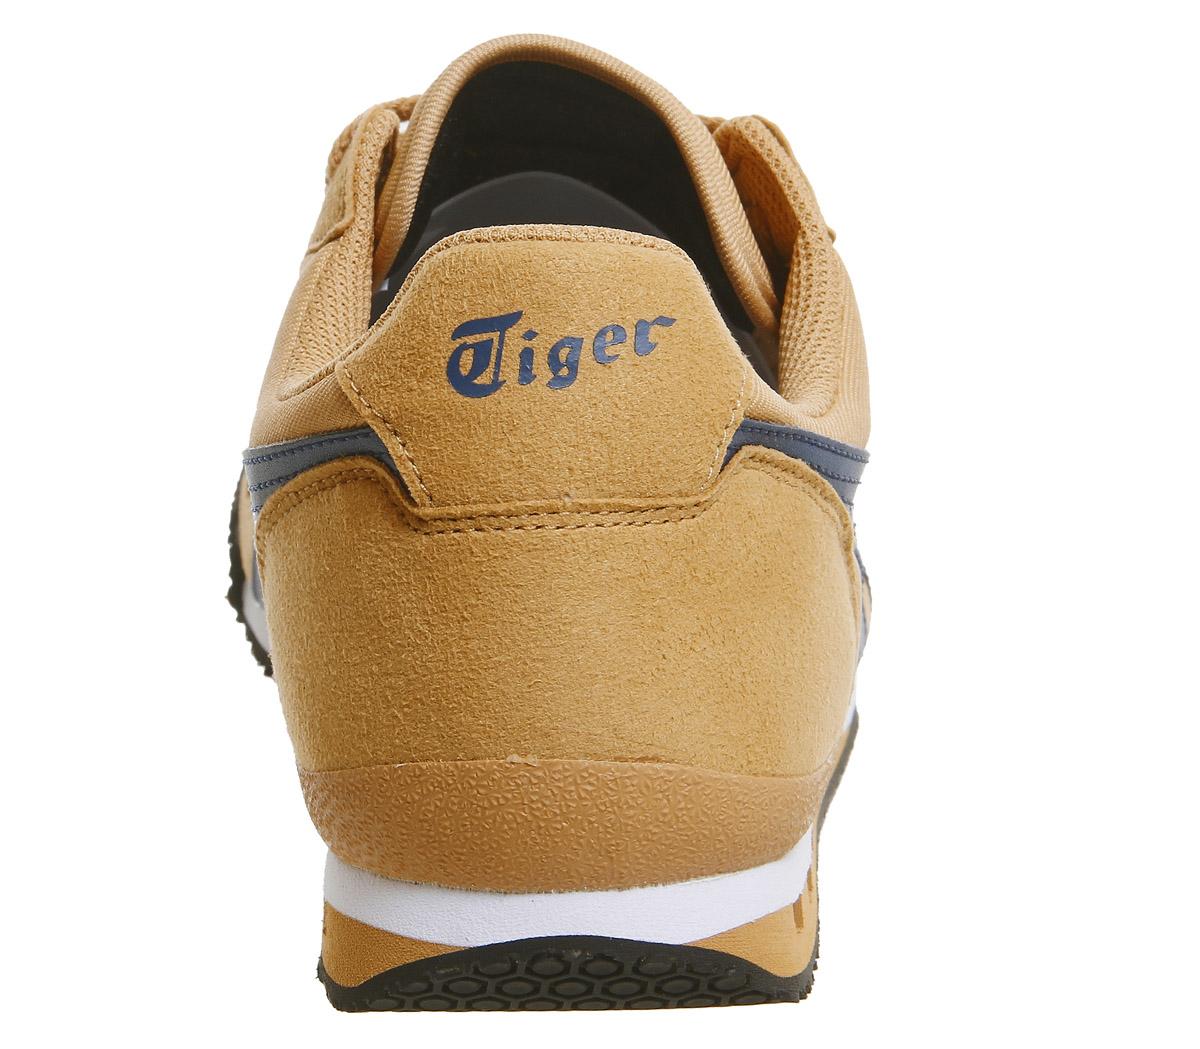 Onitsuka Tiger Ultimate 81 Trainers CARAVAN MIDNIGHT Blau Trainers Trainers Trainers Schuhes 2325d1